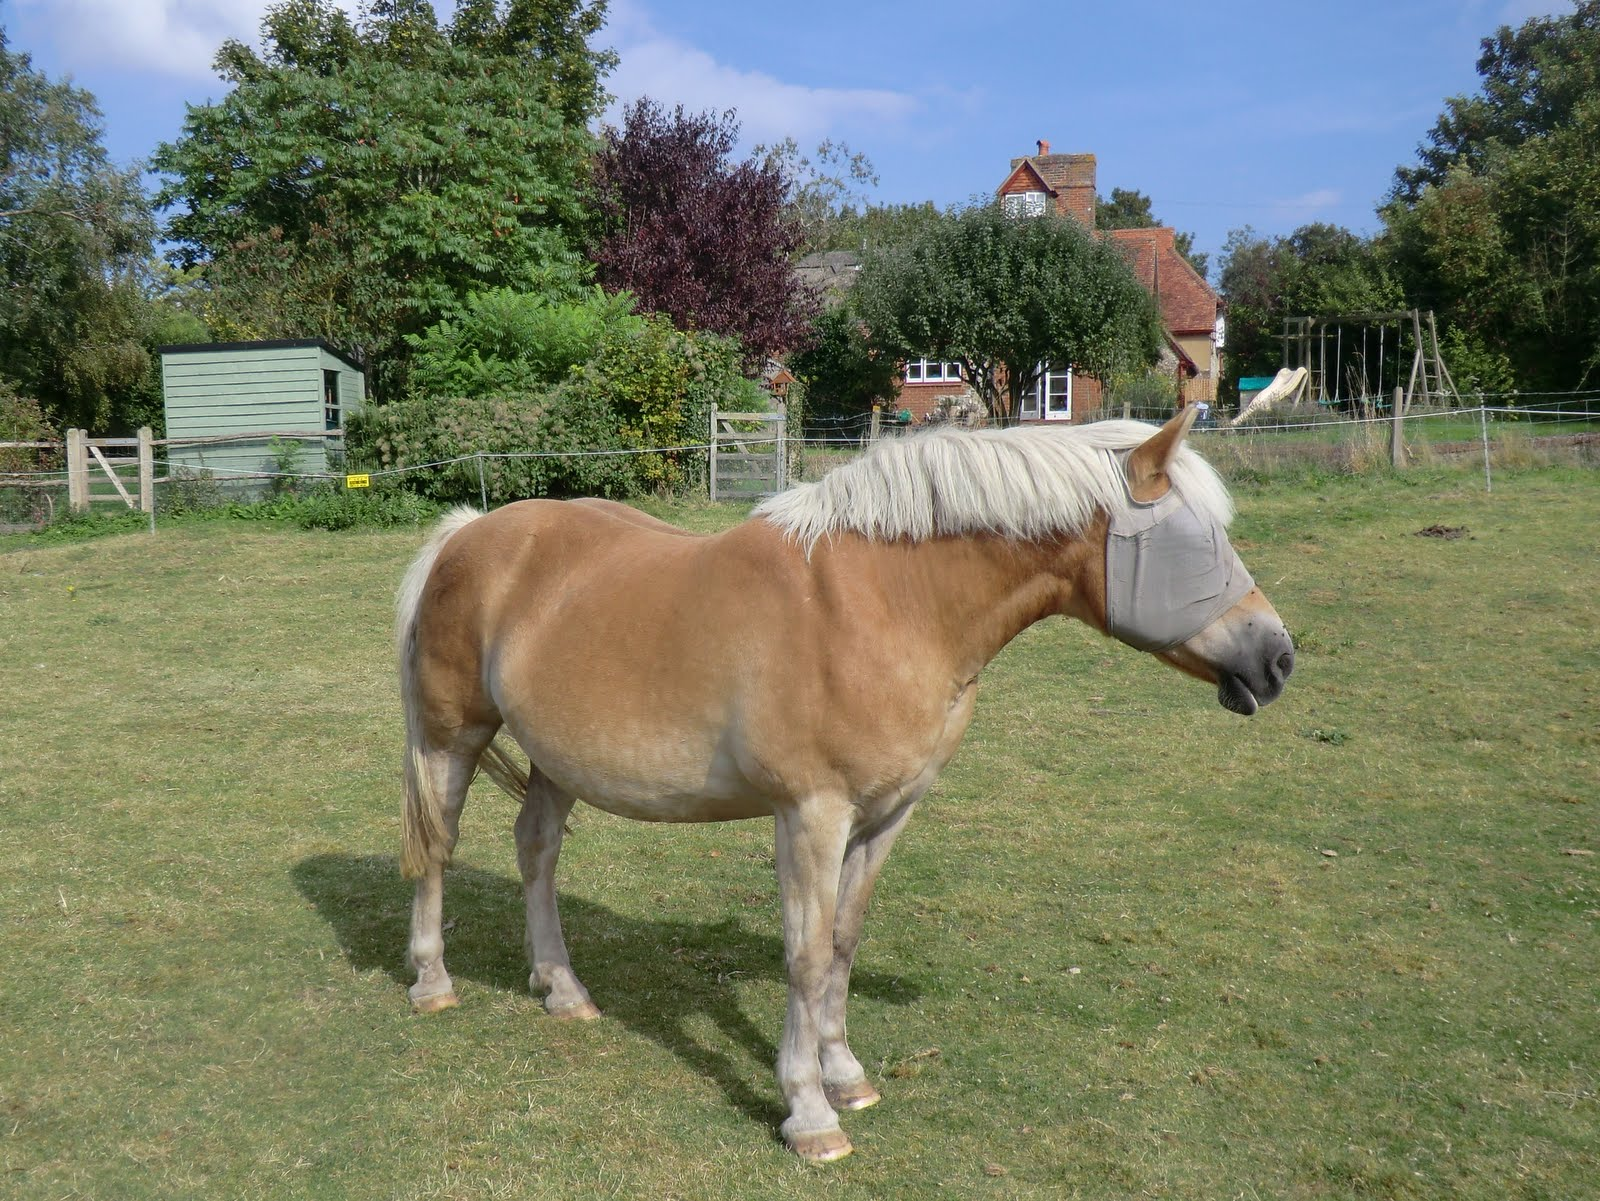 CIMG4749 Horse in field, Wepham